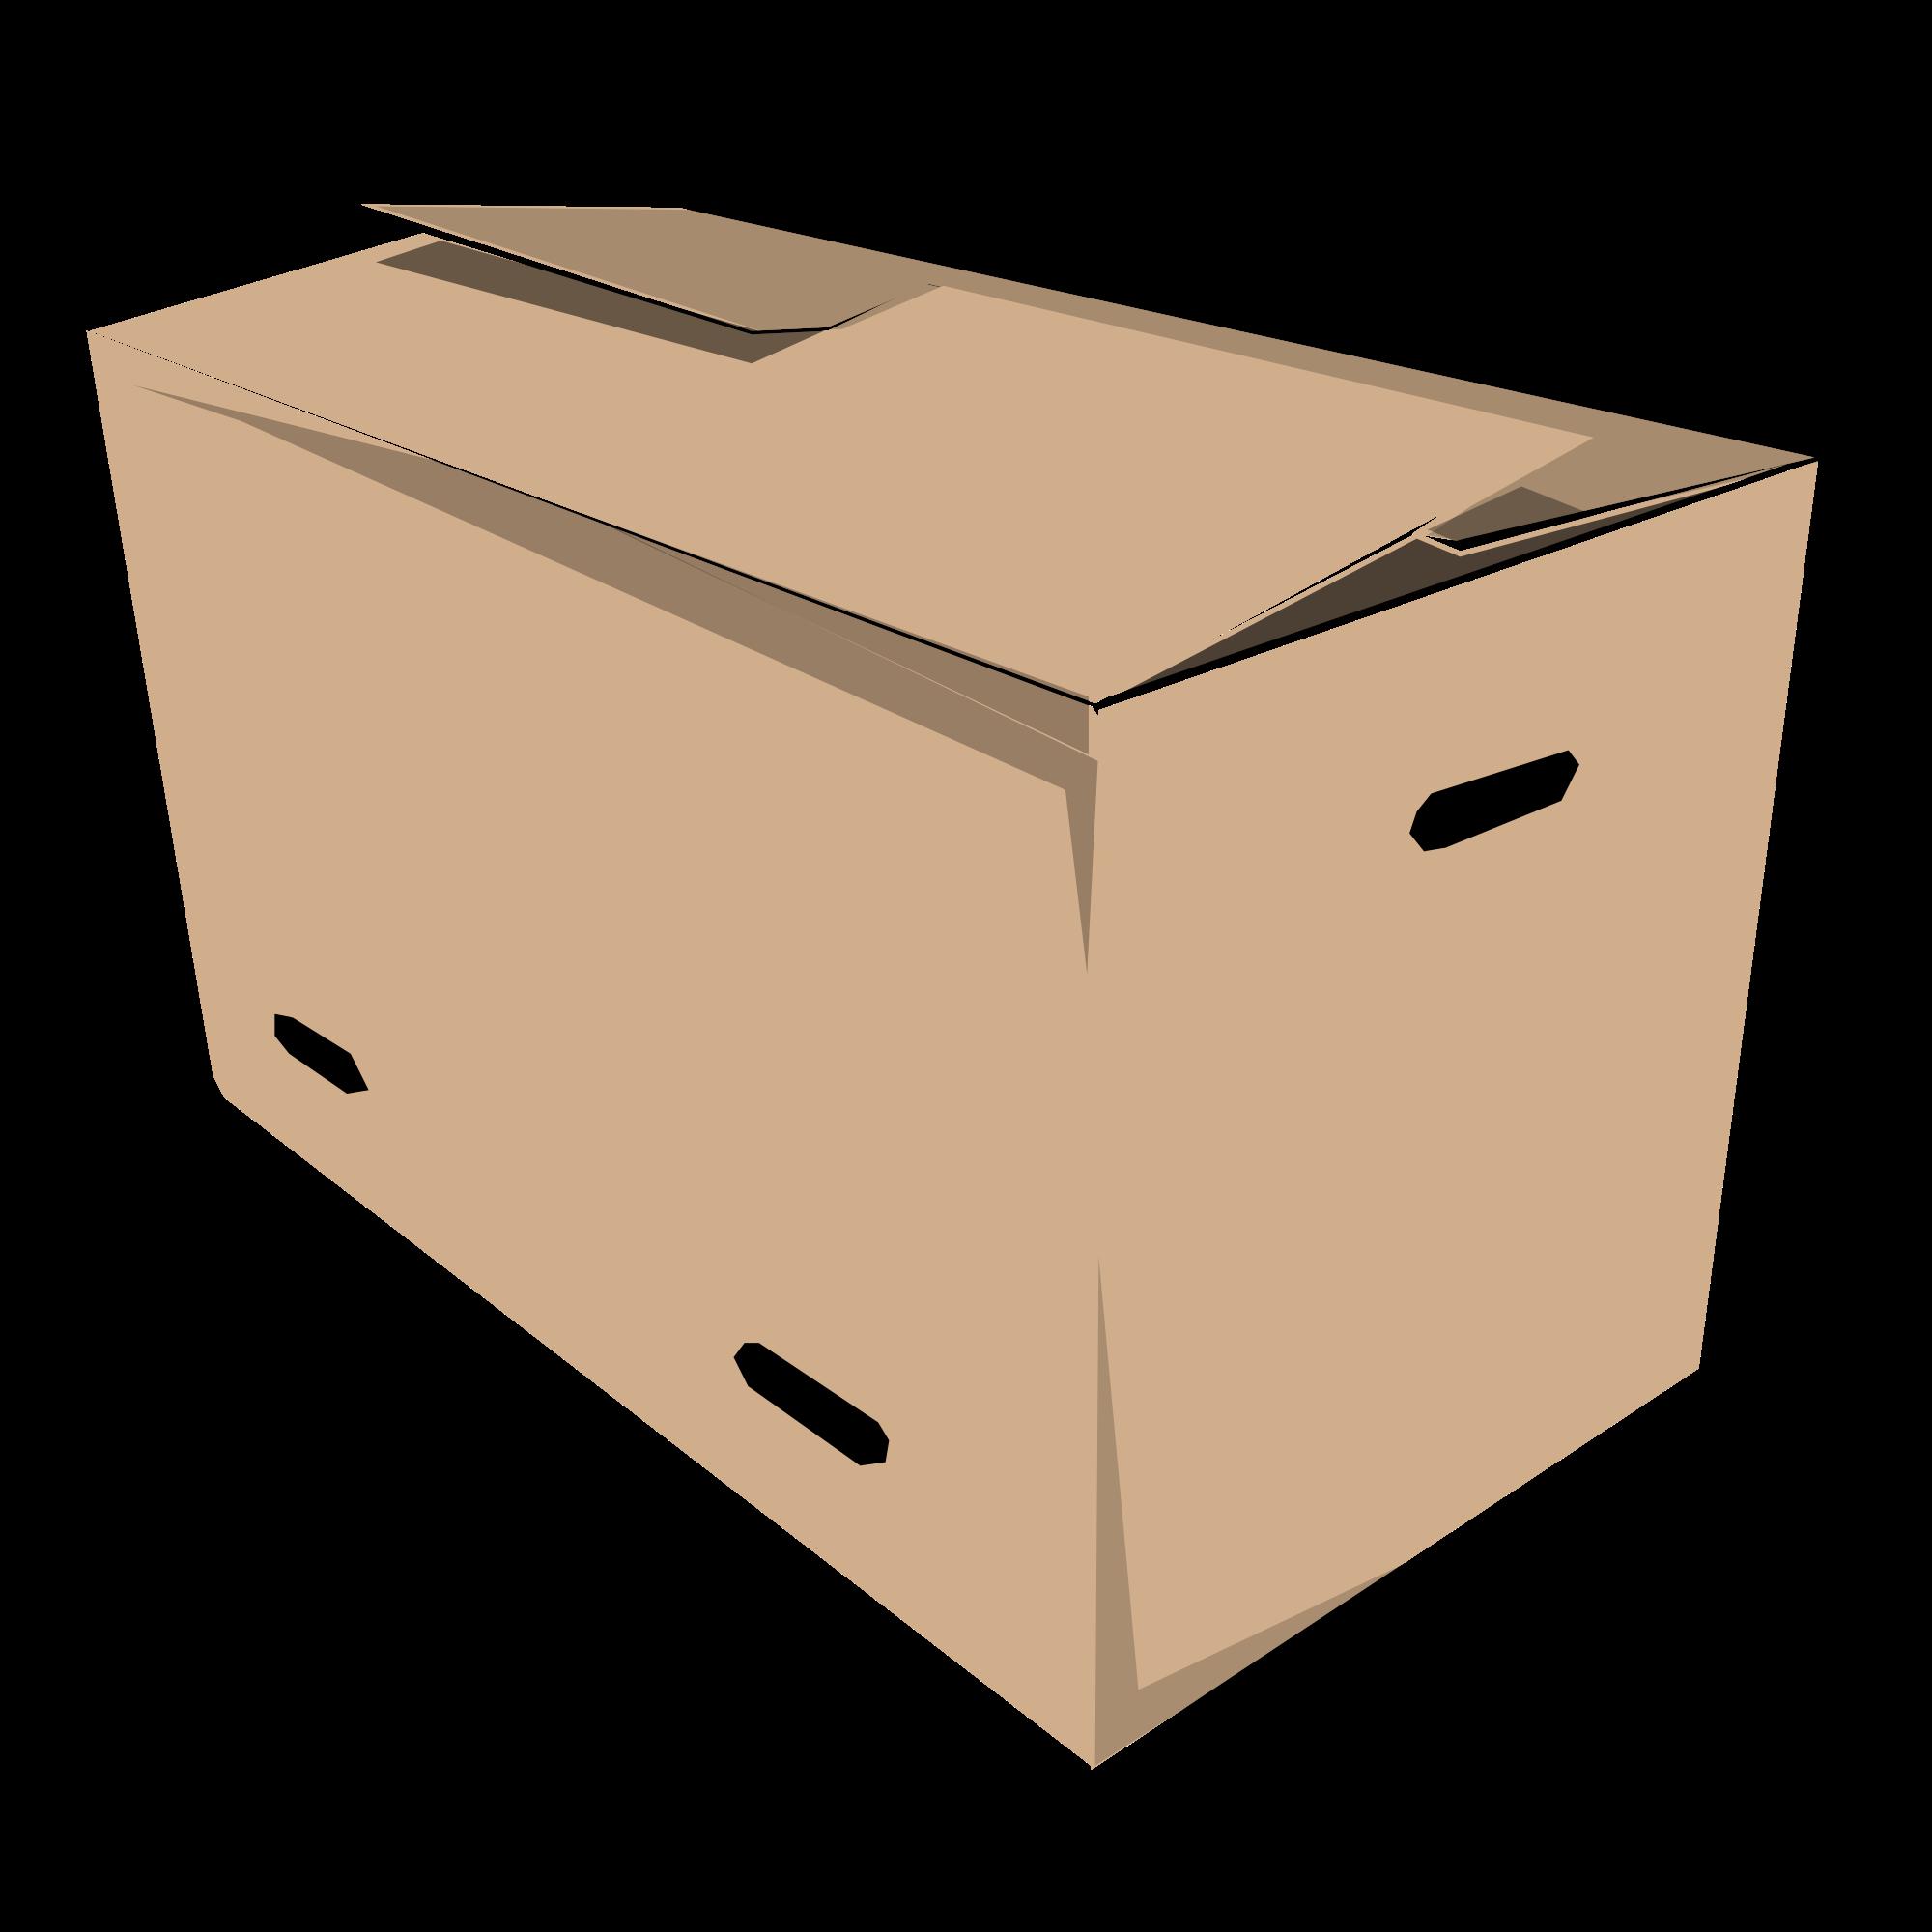 clipart black and white library File juliane krug svg. Box clipart closed box